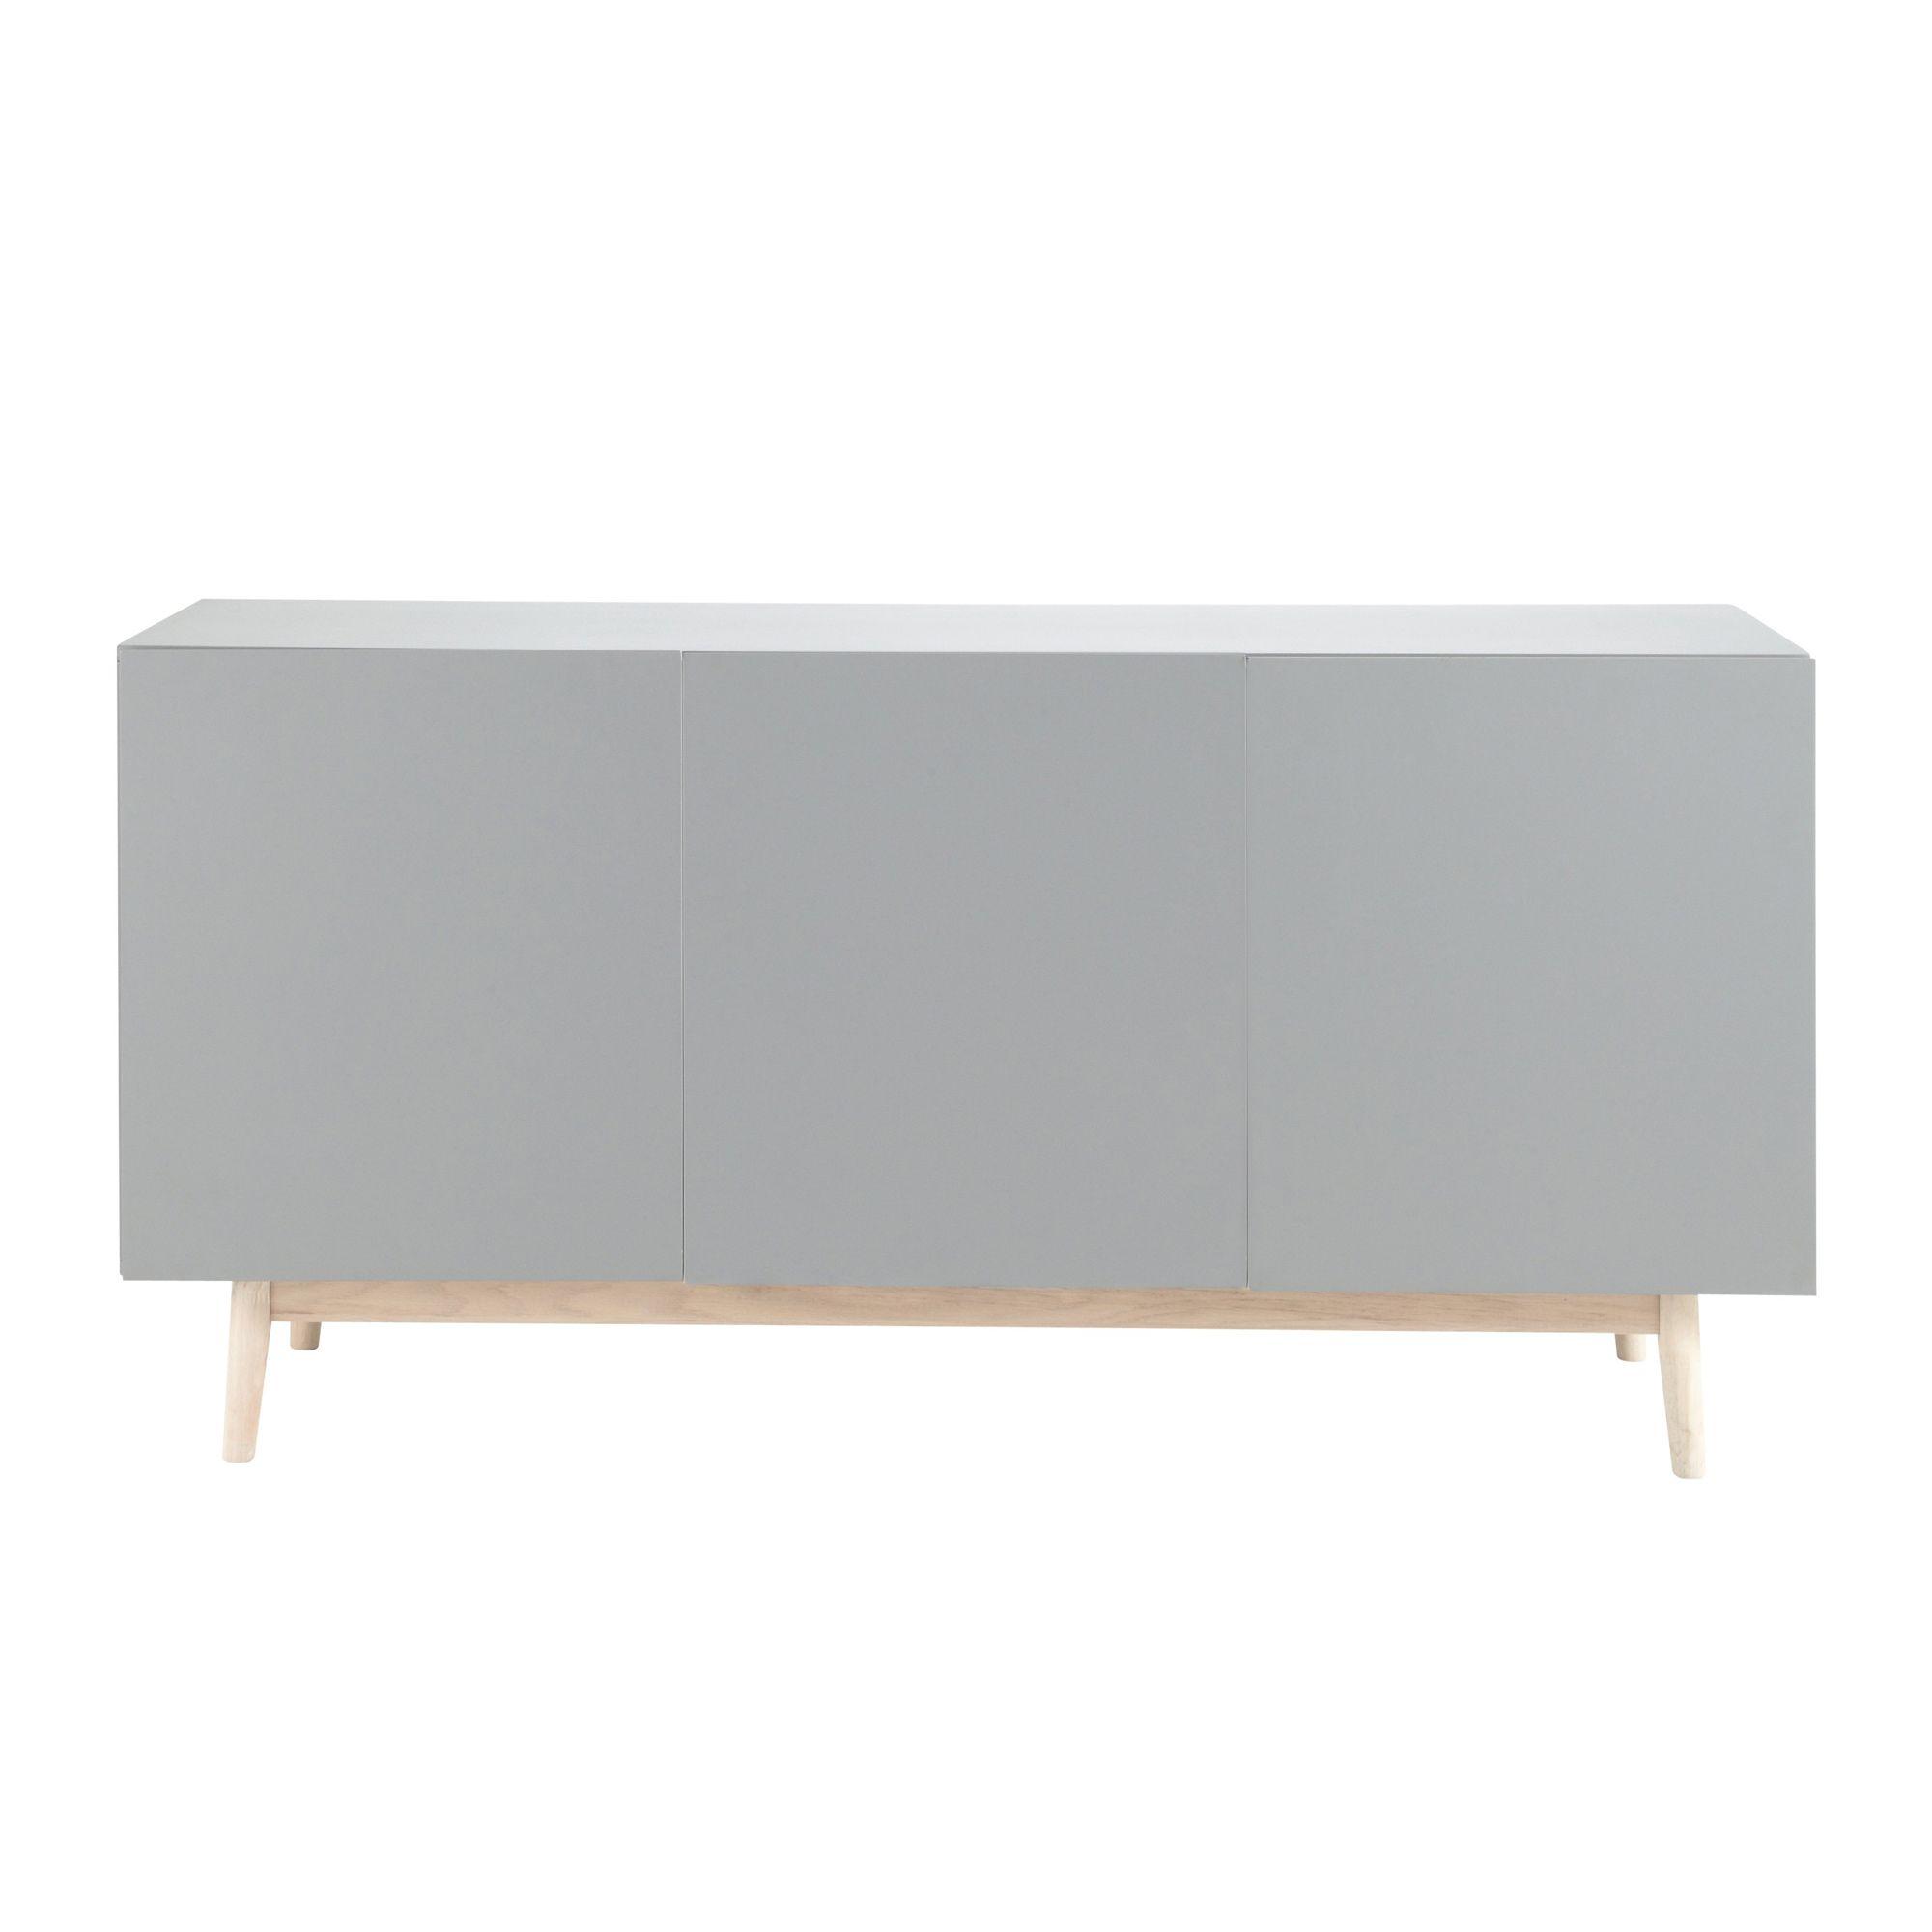 Wooden Vintage Sideboard In Grey W 160cm Artic Vintage Sideboard Sideboard Grey Sideboards Living Room